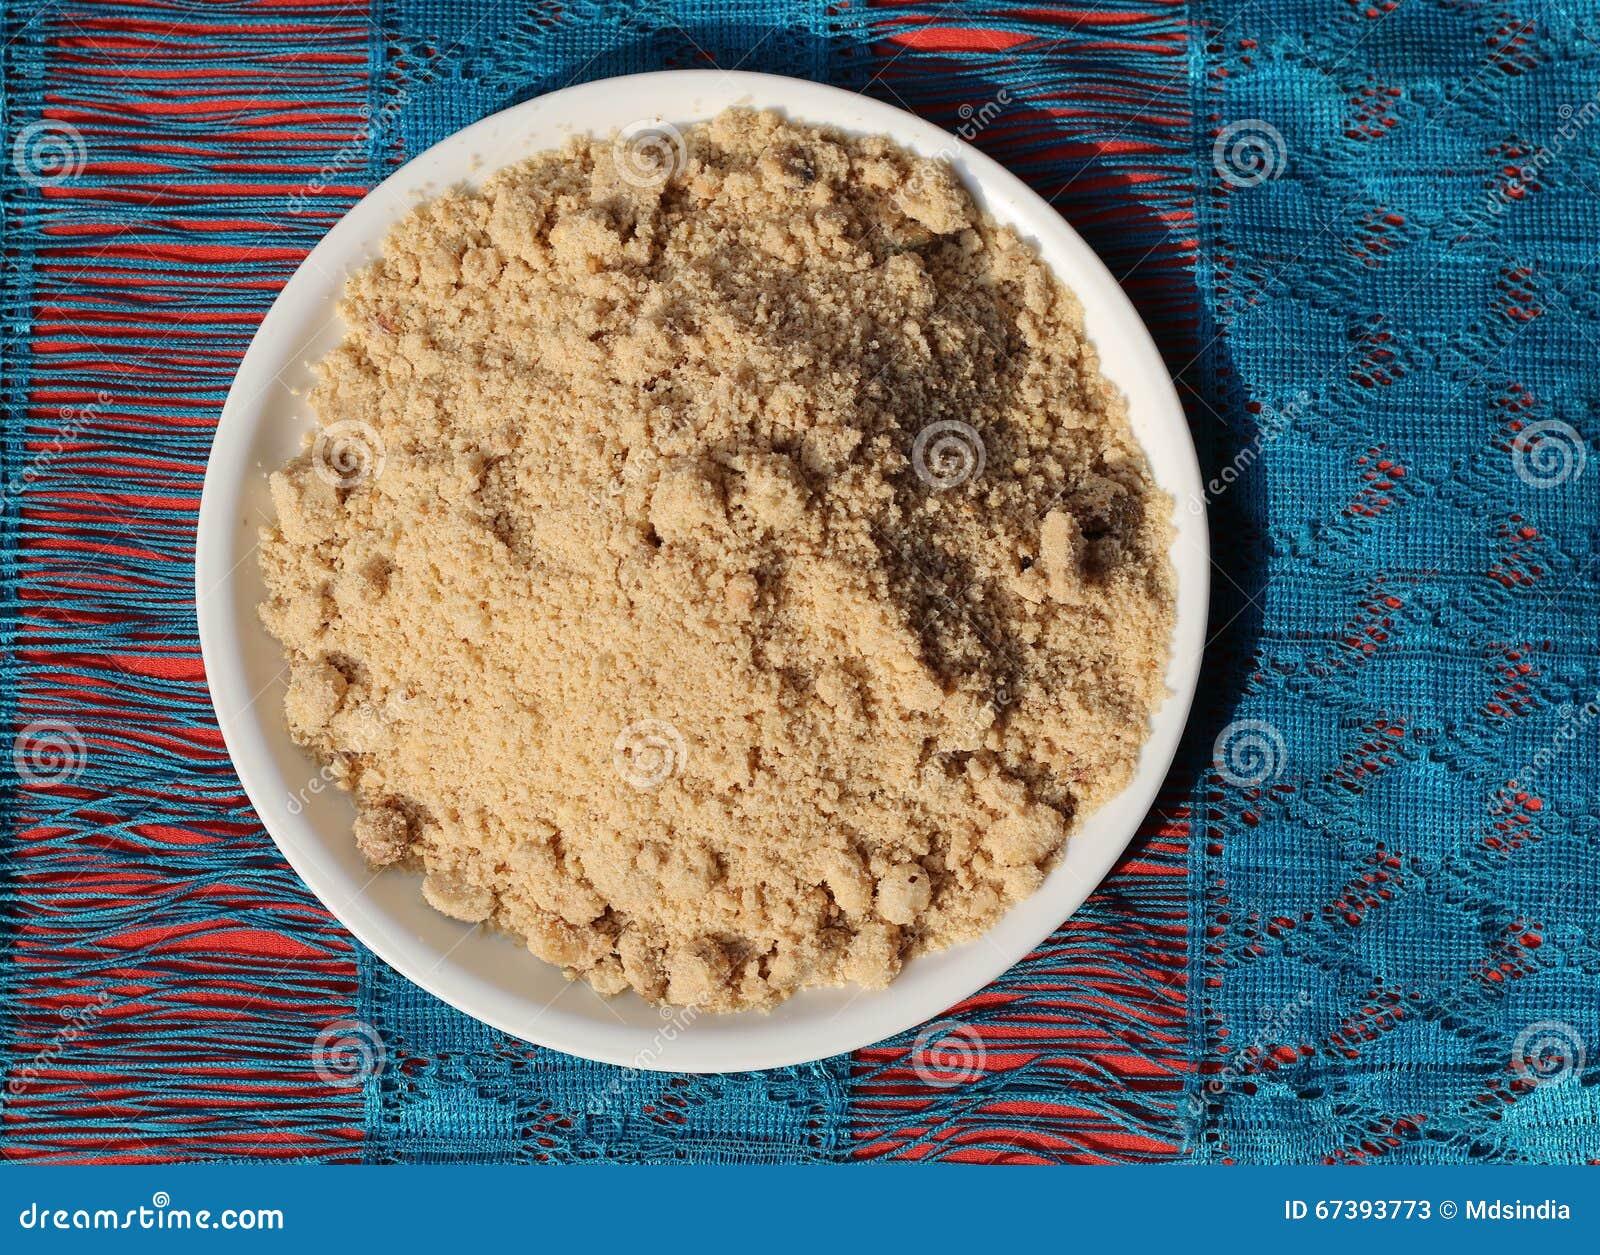 Indian traditional roasted wheat flour sweet or Panjiri